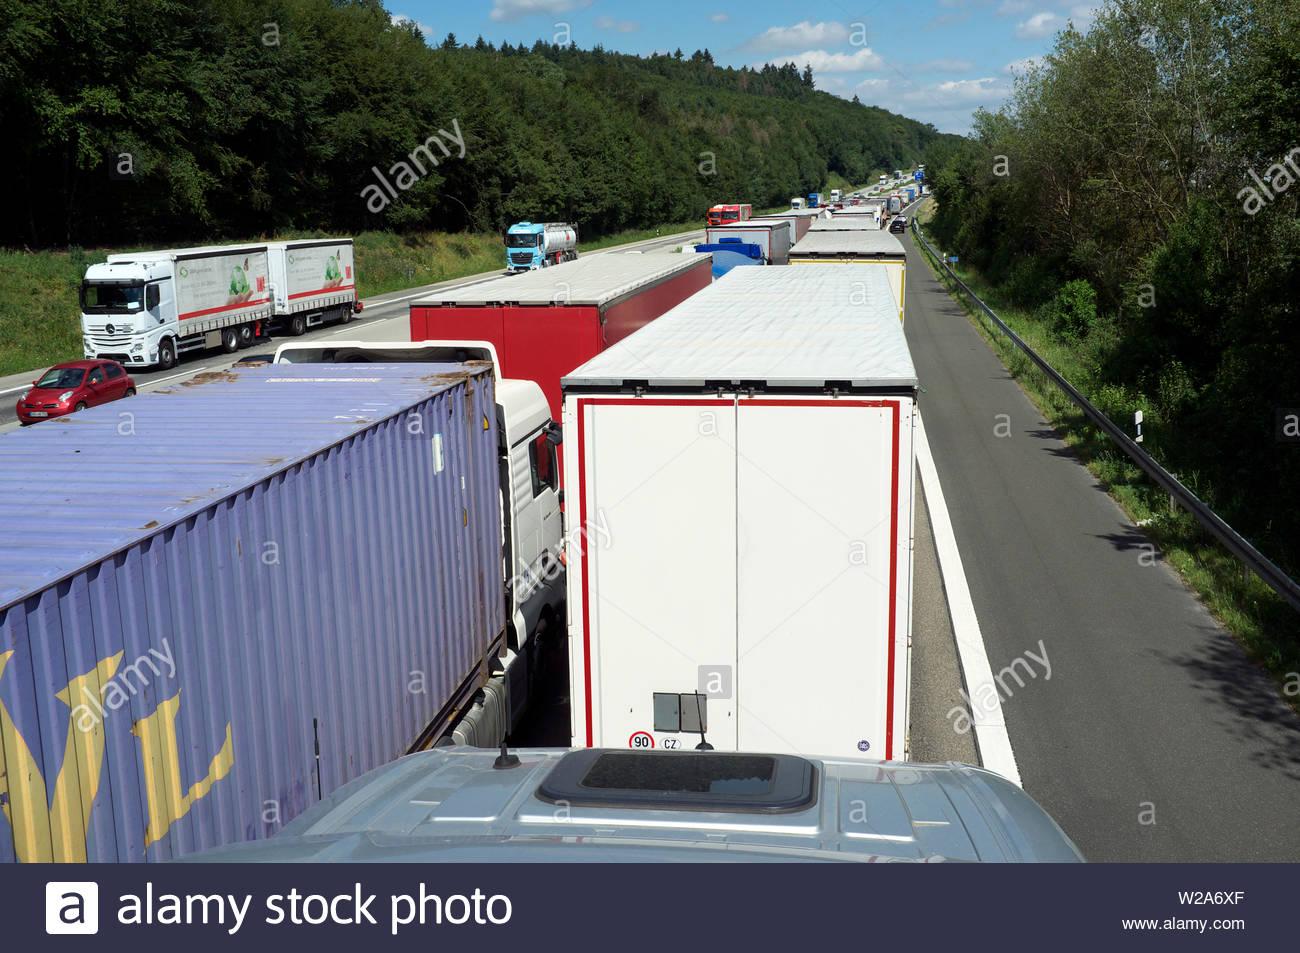 Traffic Jam A3 Stock Photos & Traffic Jam A3 Stock Images - Alamy